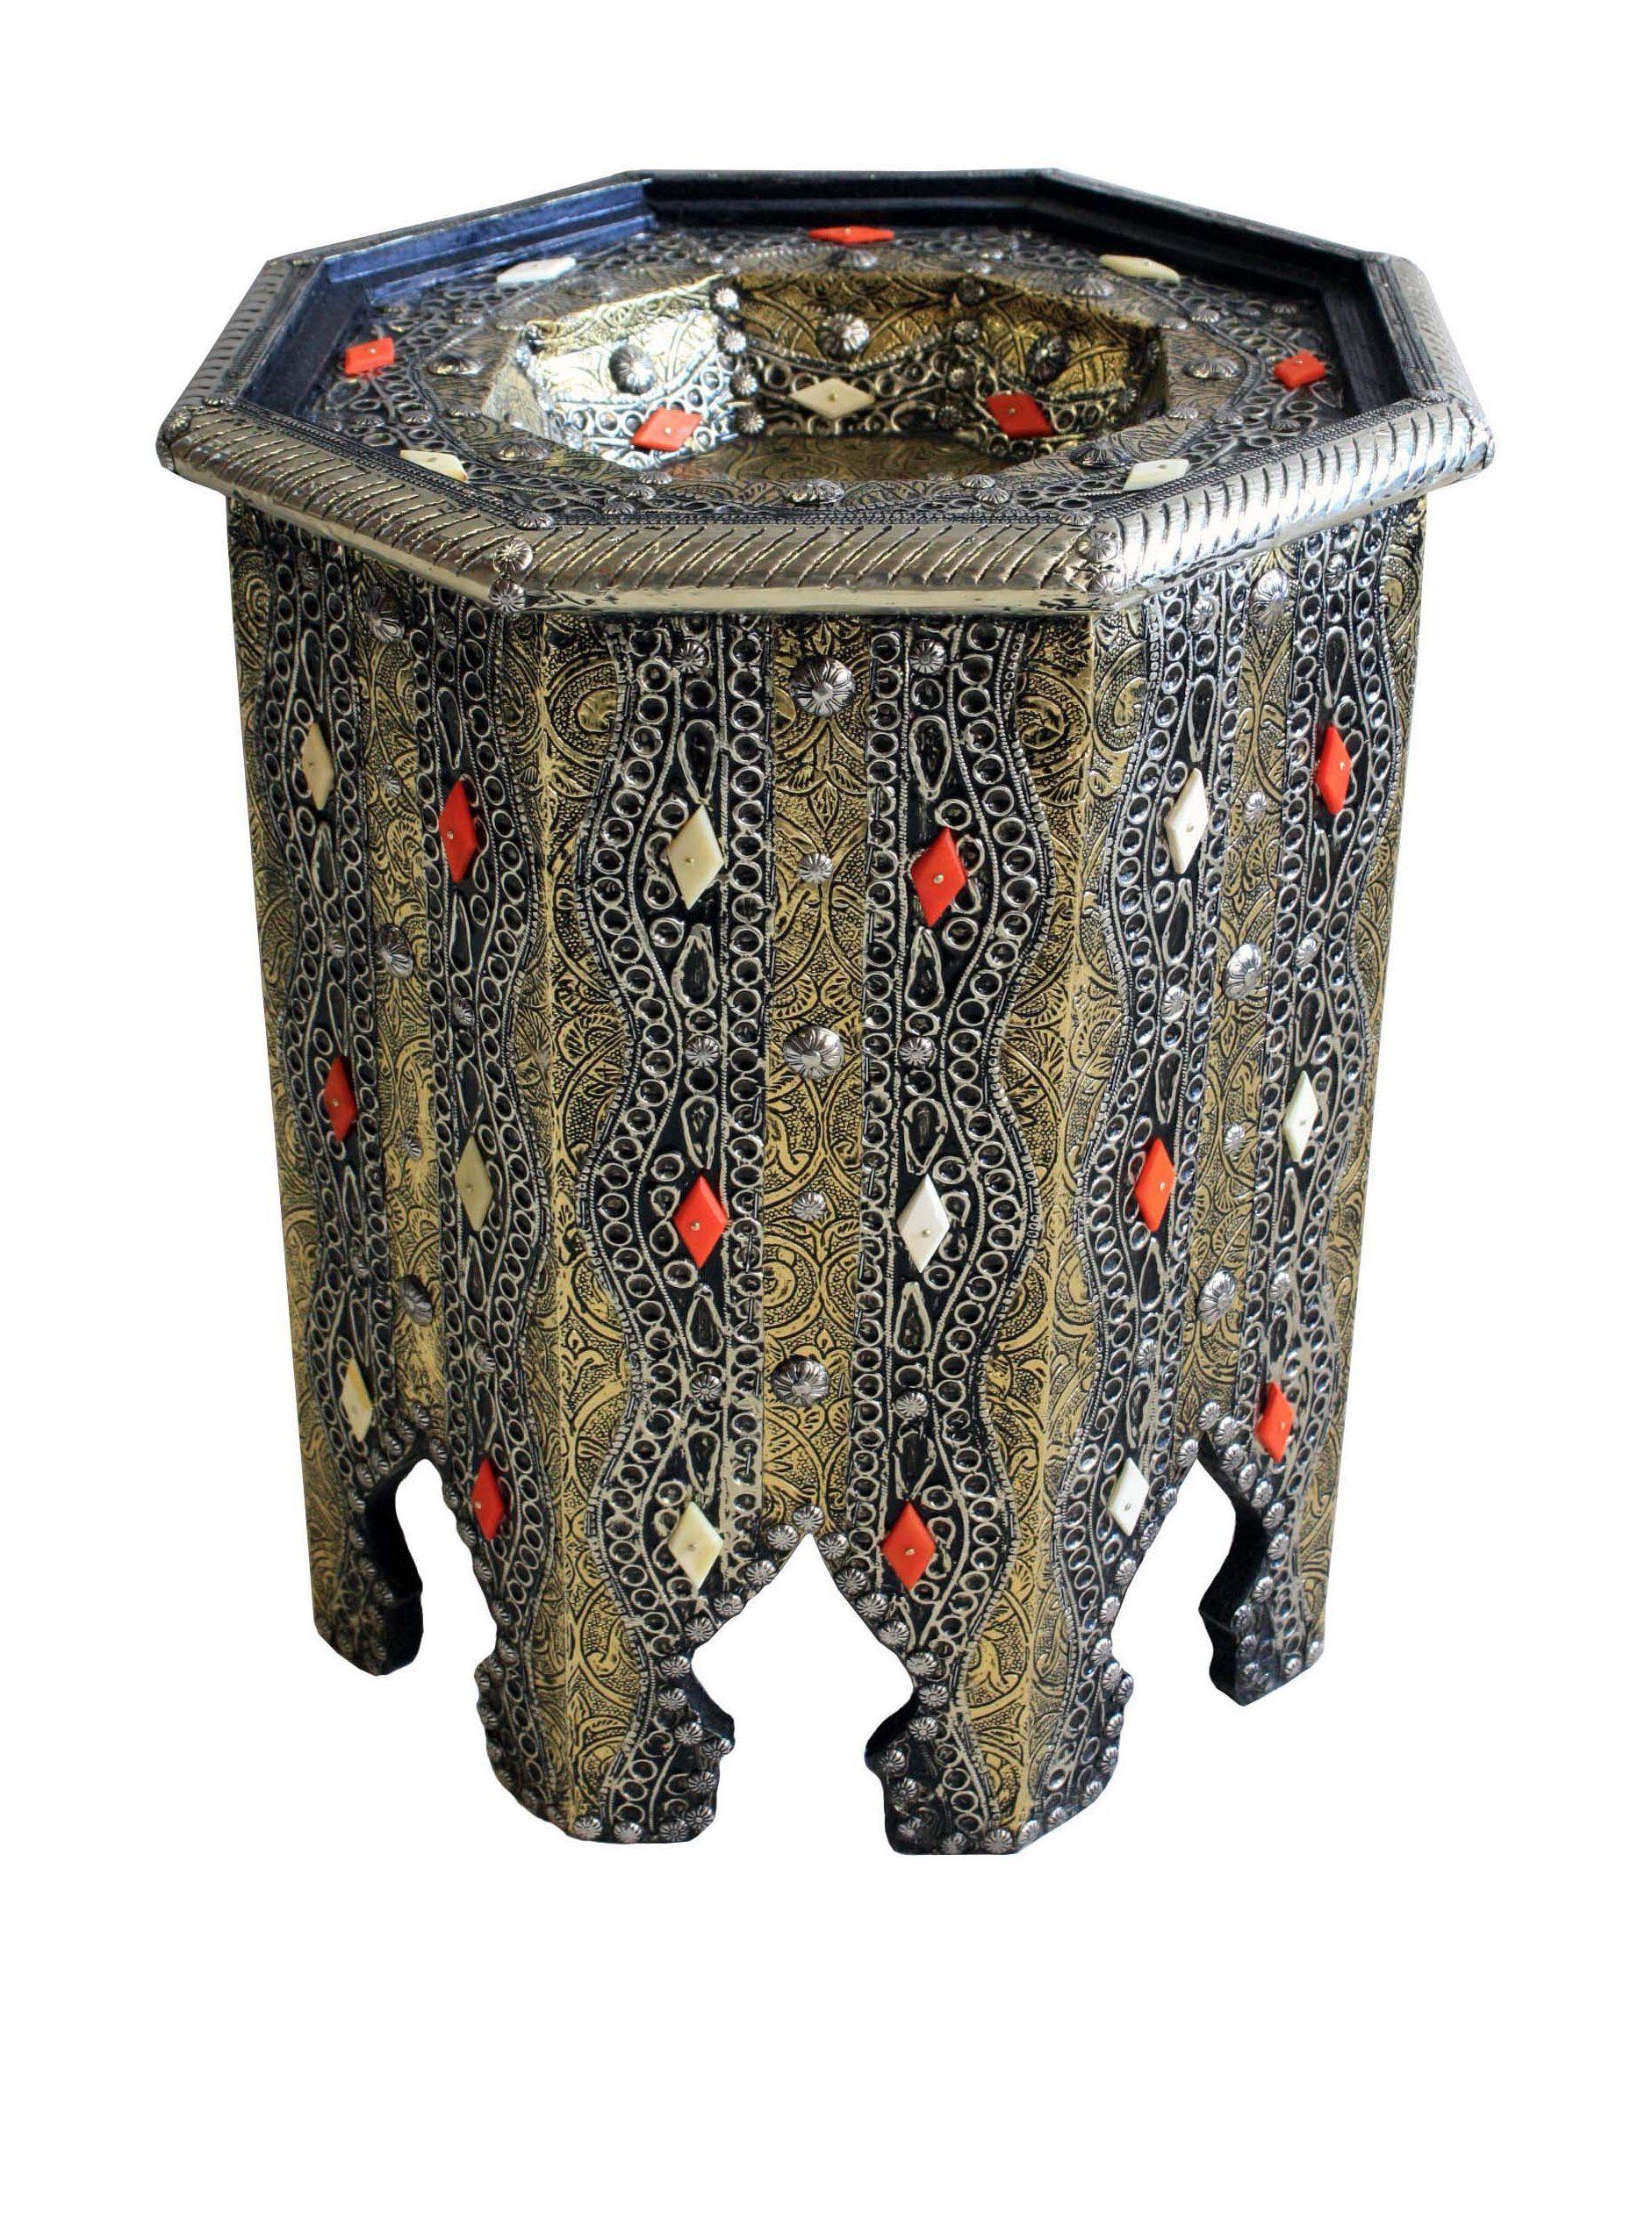 Badia Design Moroccan Metal & Bone Octagonal Side Table